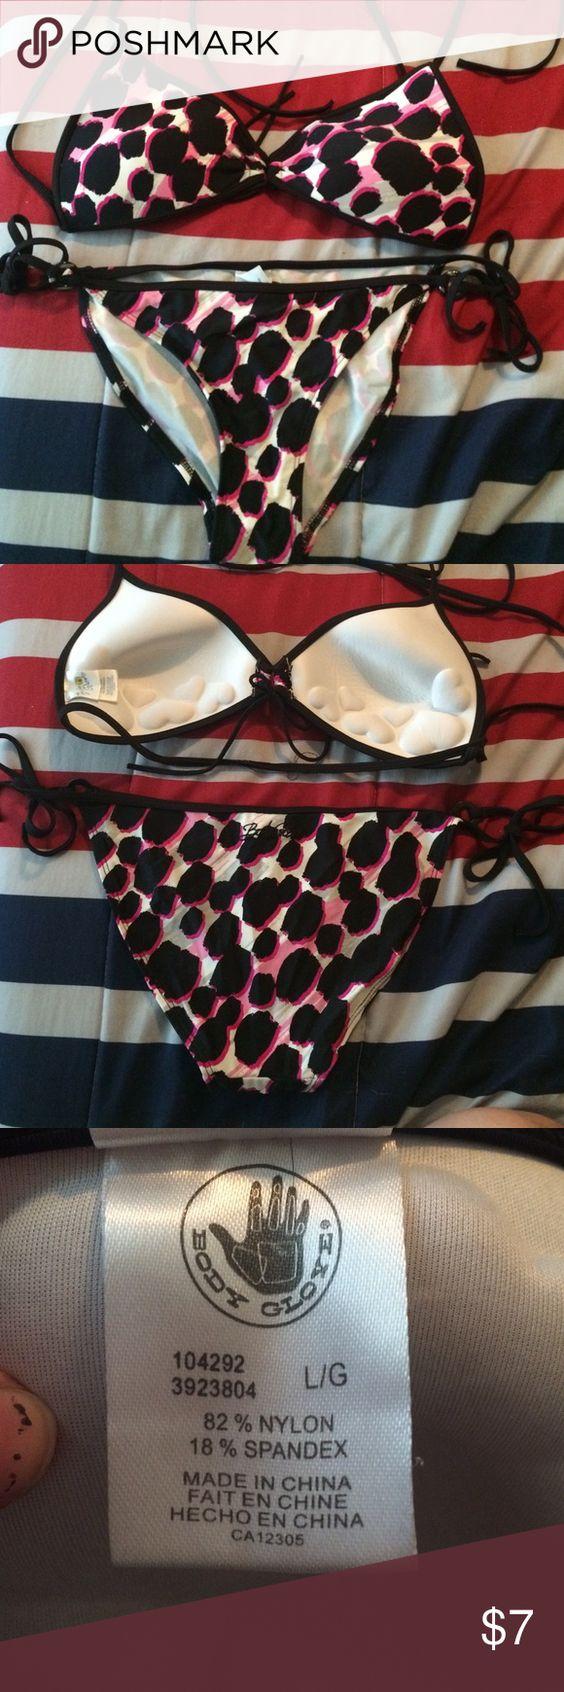 Body Glove leopard bikini Pink, black, white, and silver bikini. Top and bottom both size large. Send me offers!☺️ Body Glove Swim Bikinis